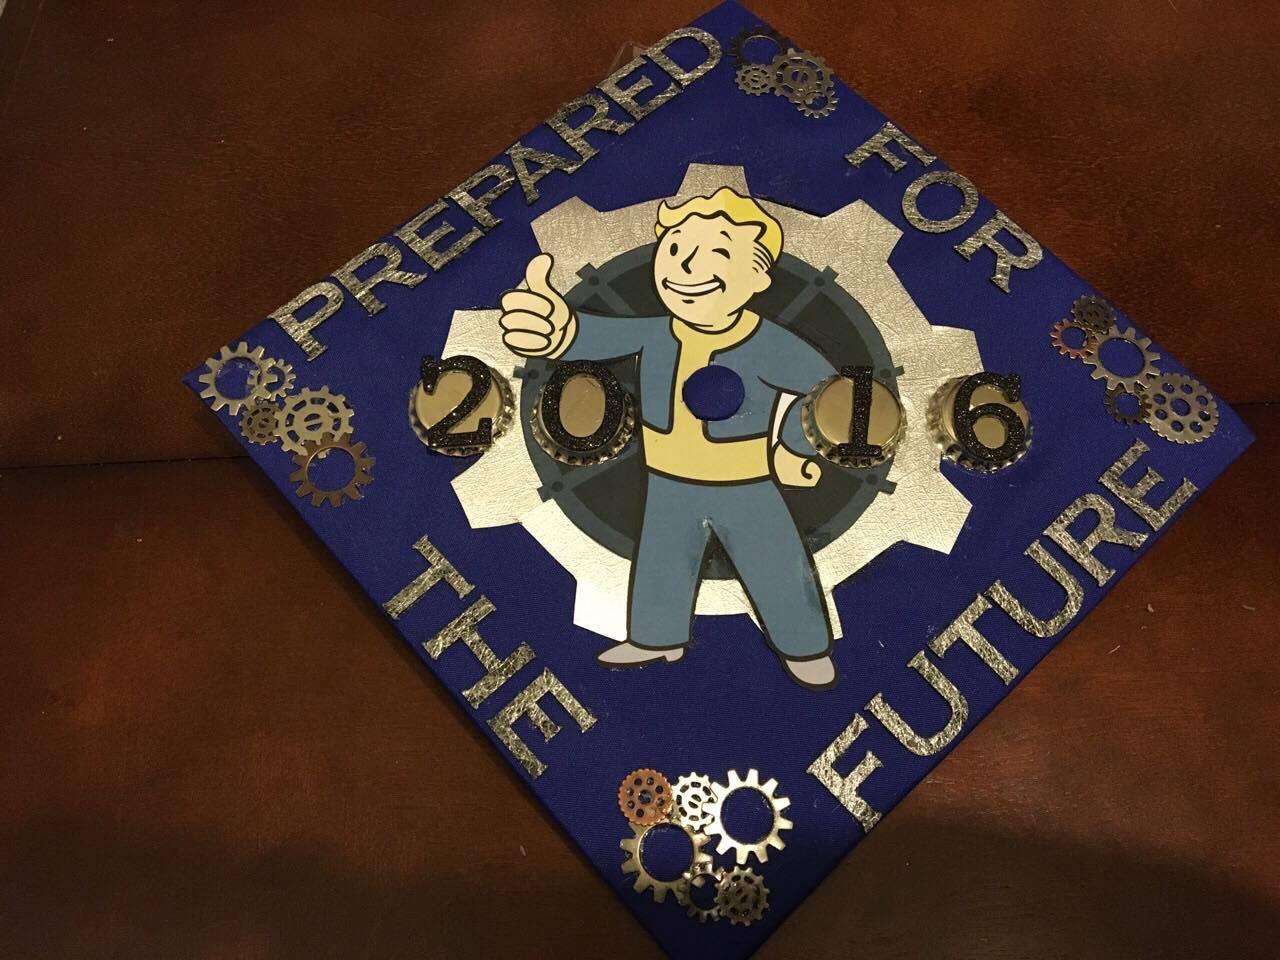 Caps off to our 2016 graduates